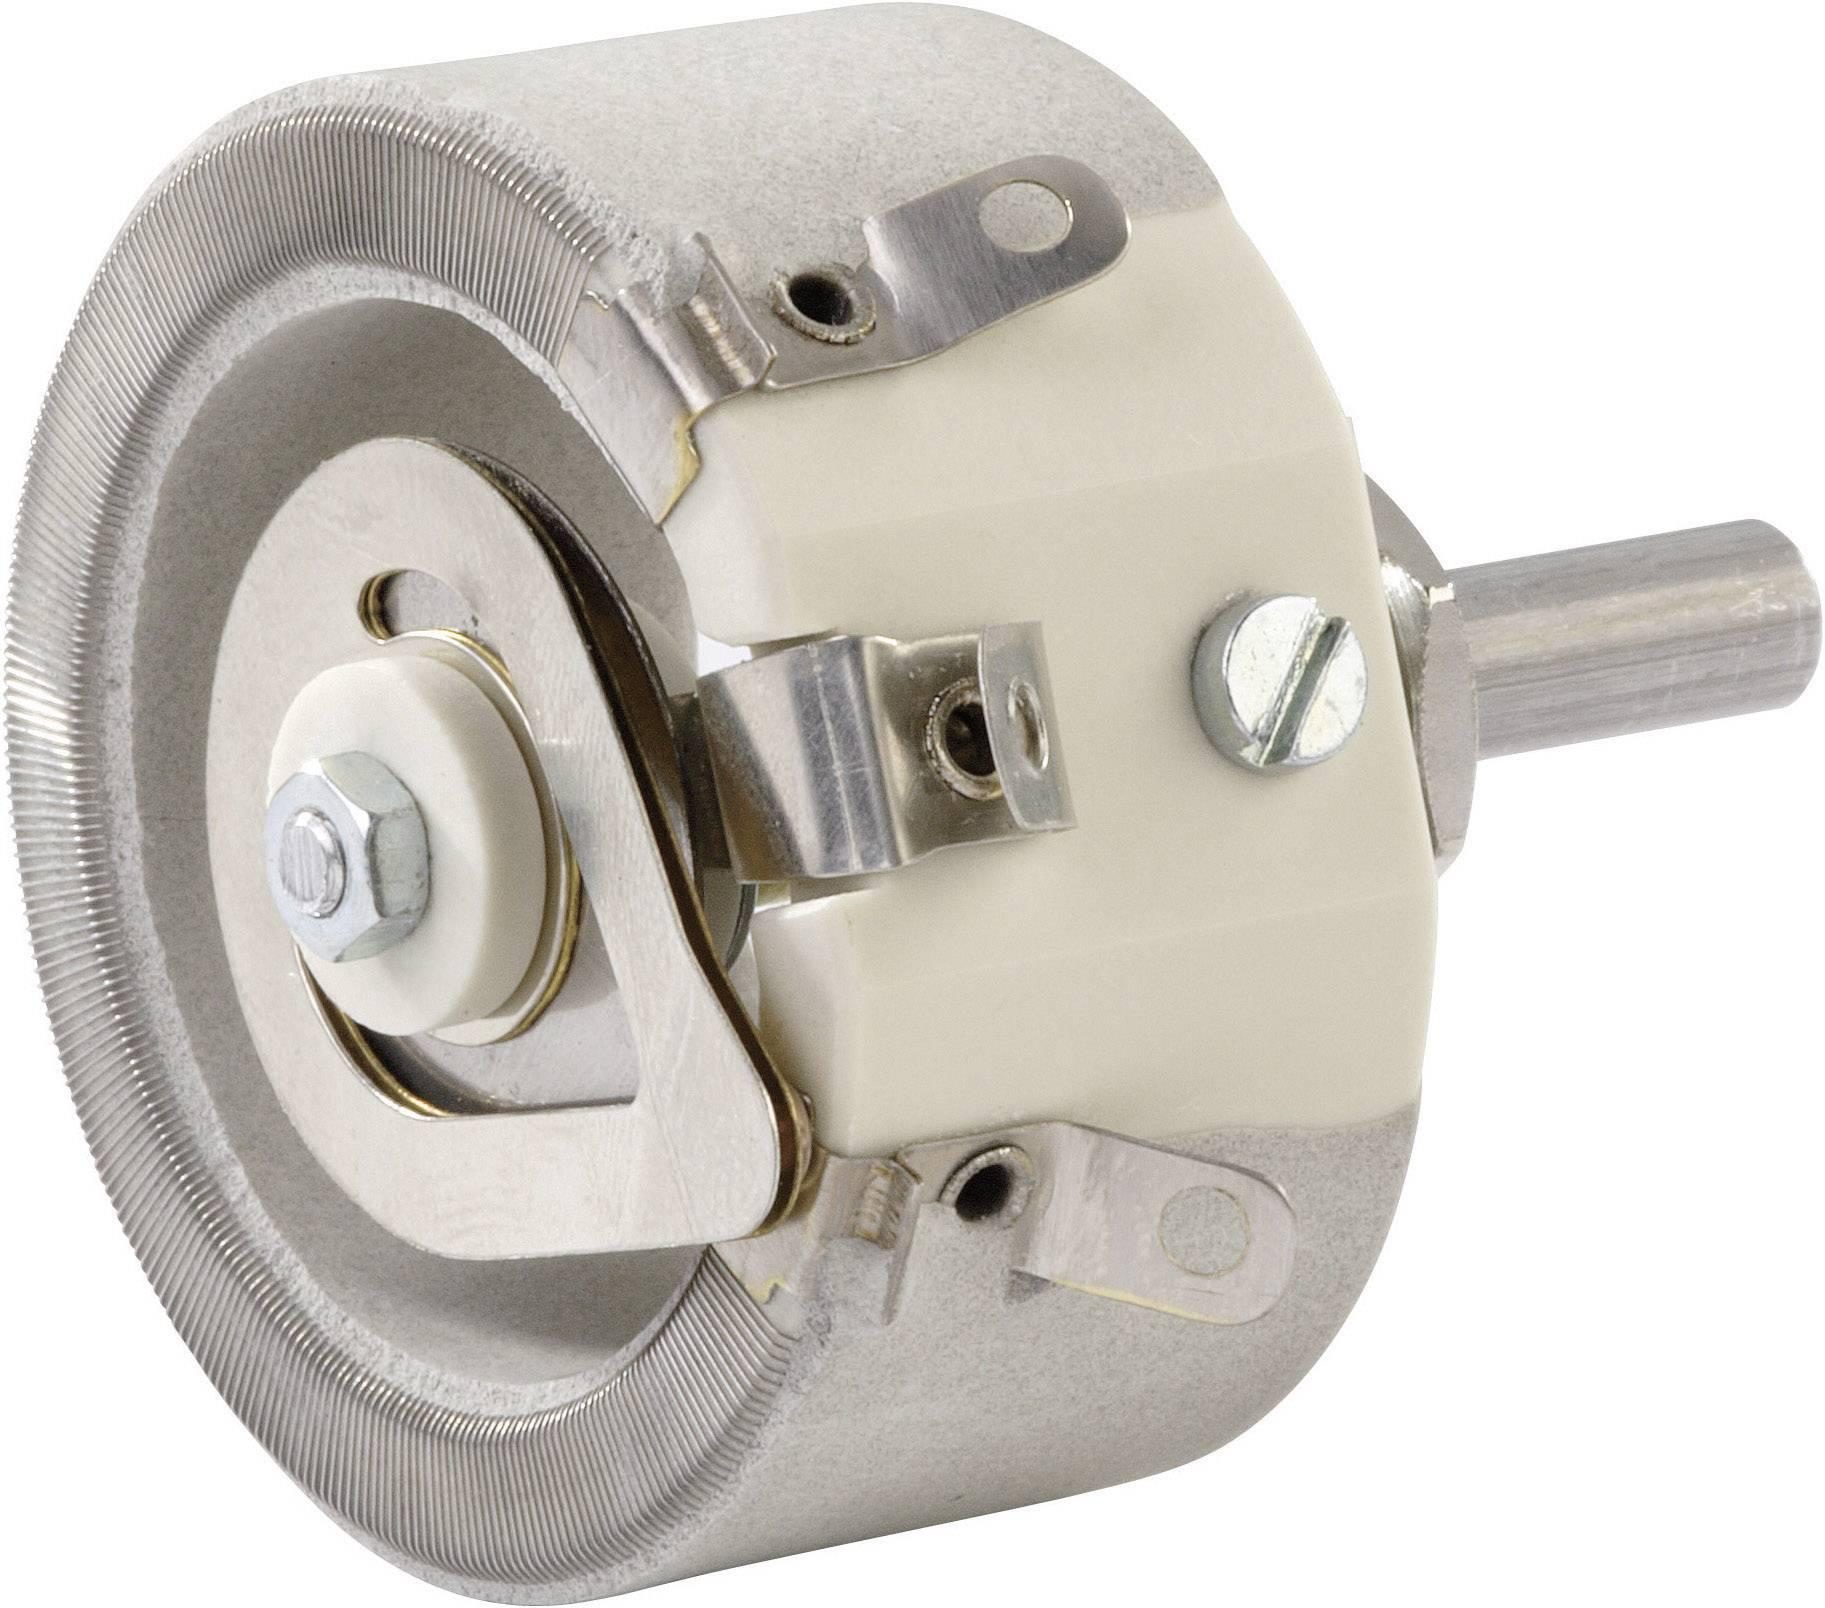 Drôtový potenciometer mono TT Electronics AB 3191002050 3191002050, 10 W, 47 Ohm, 1 ks